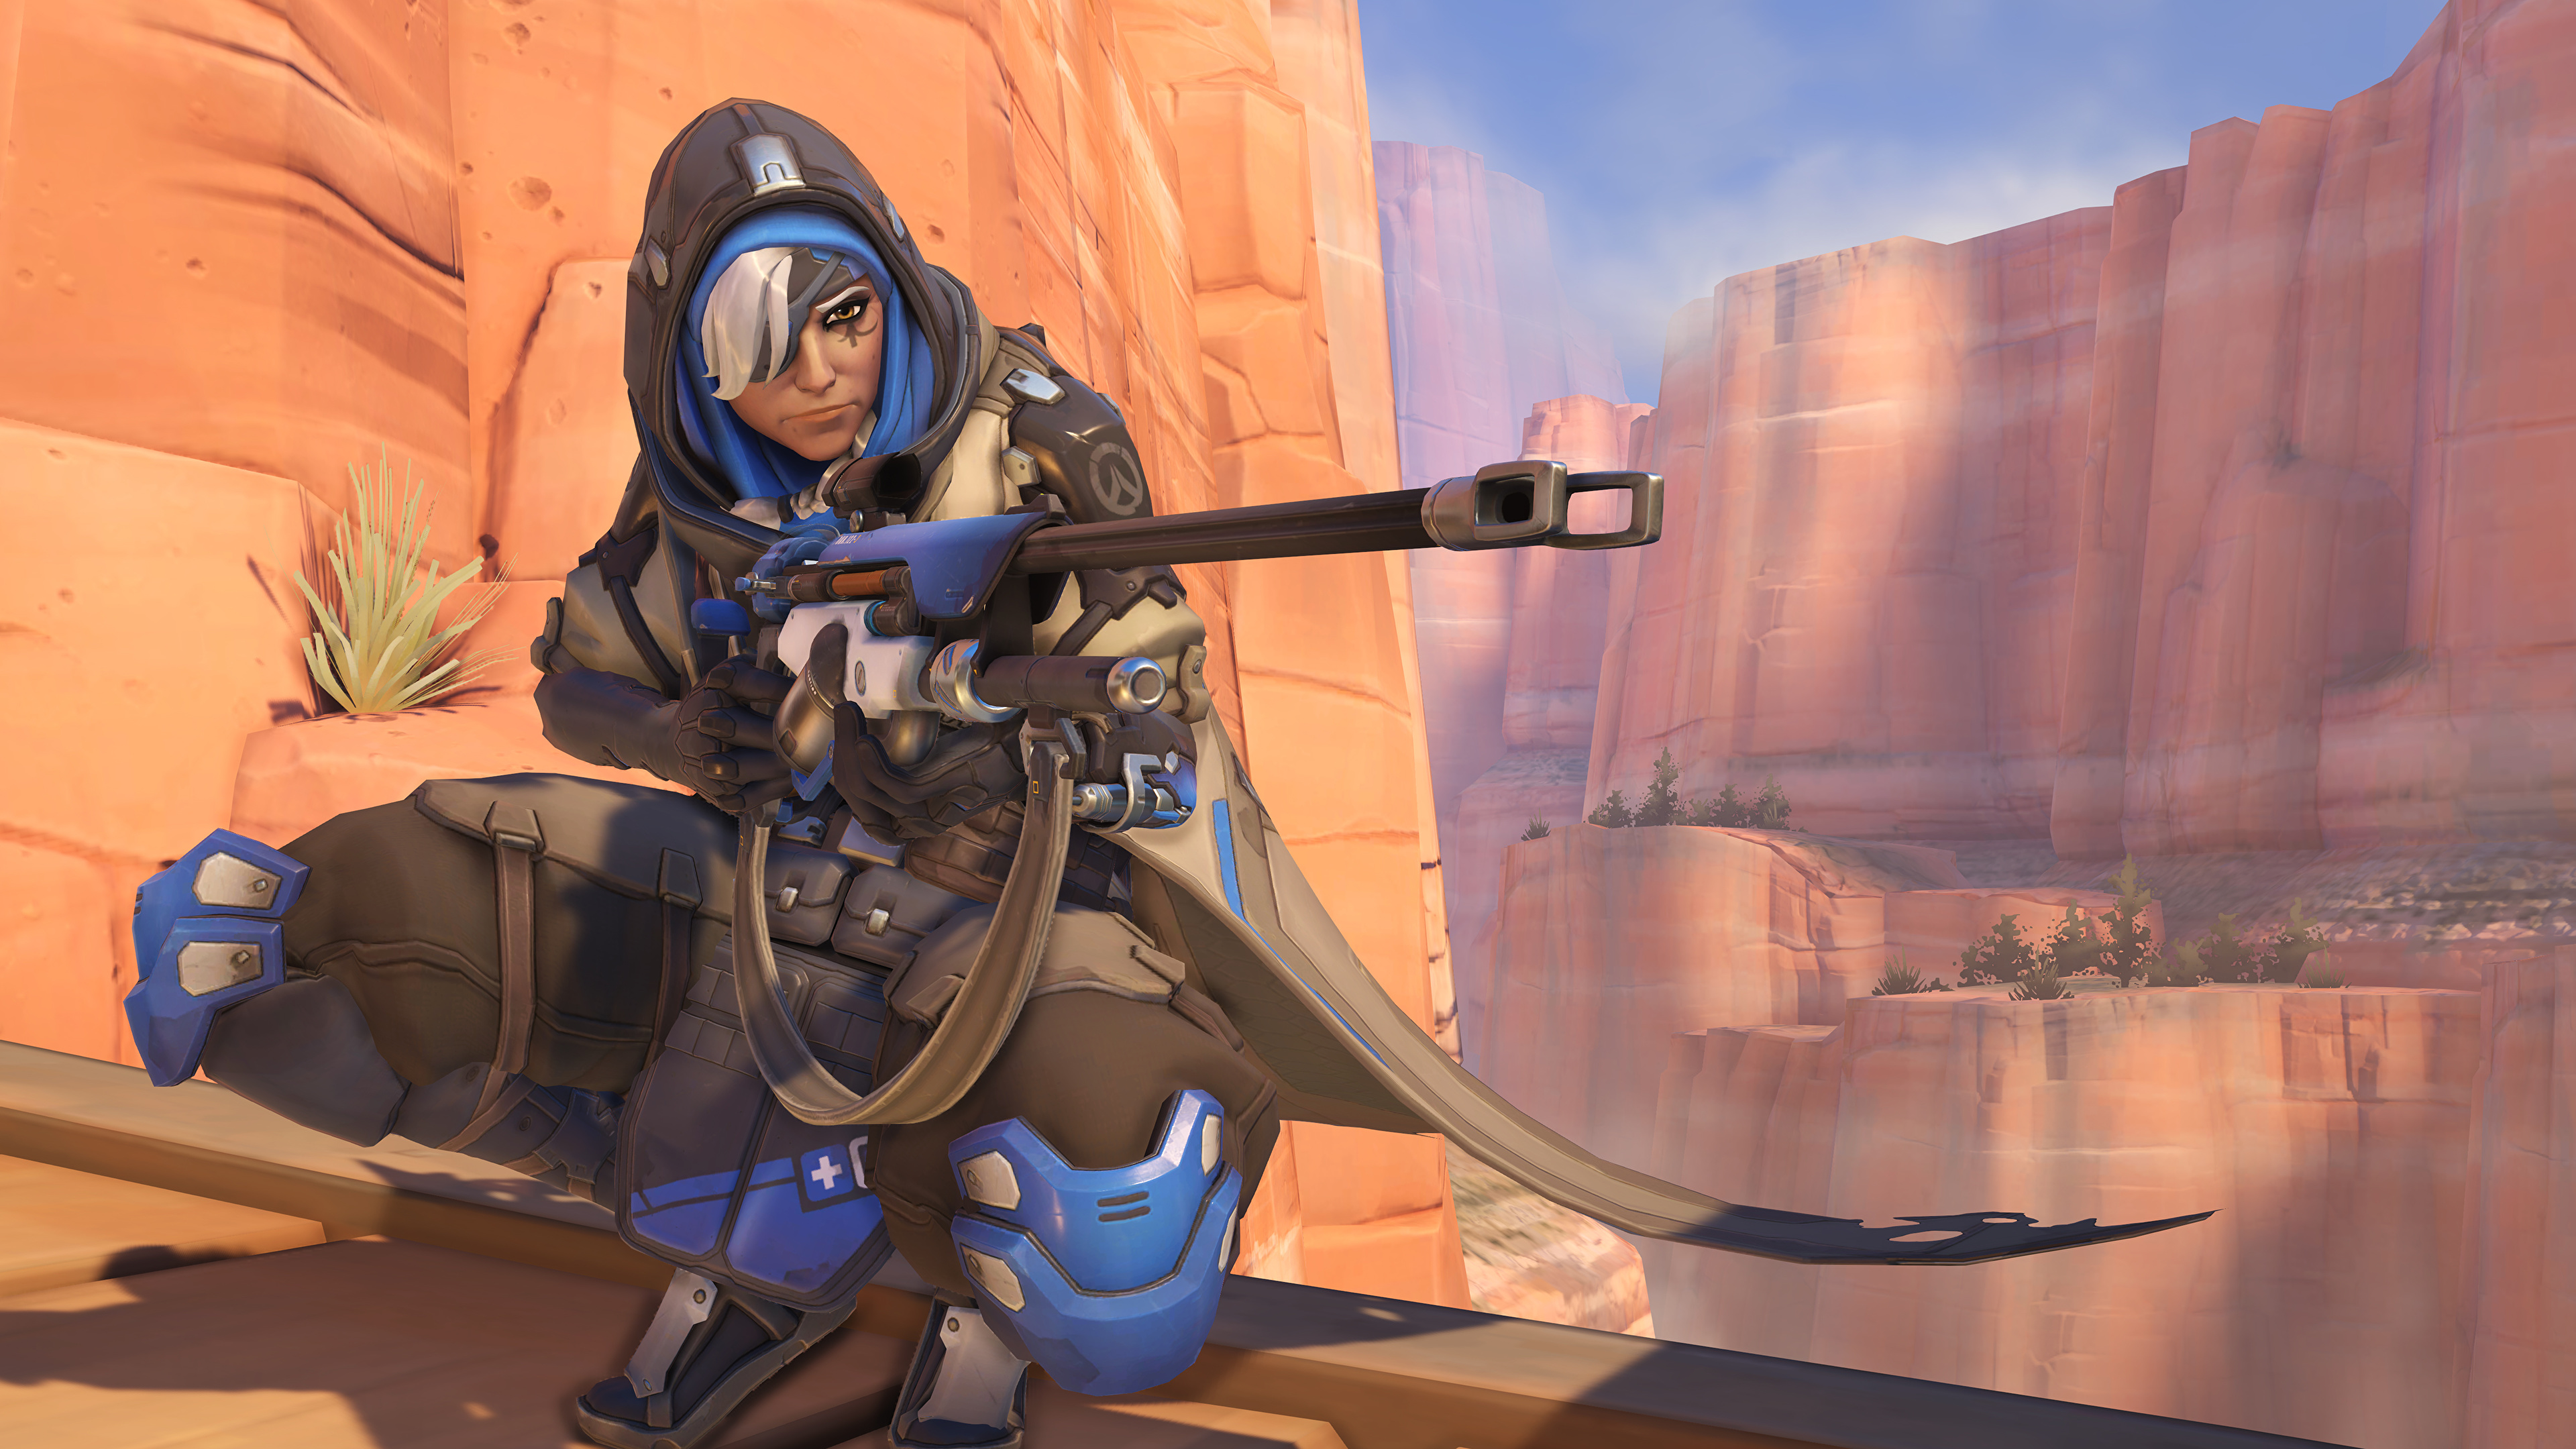 Wallpaper Overwatch Sniper Rifle Snipers Warrior Ana 3840x2160